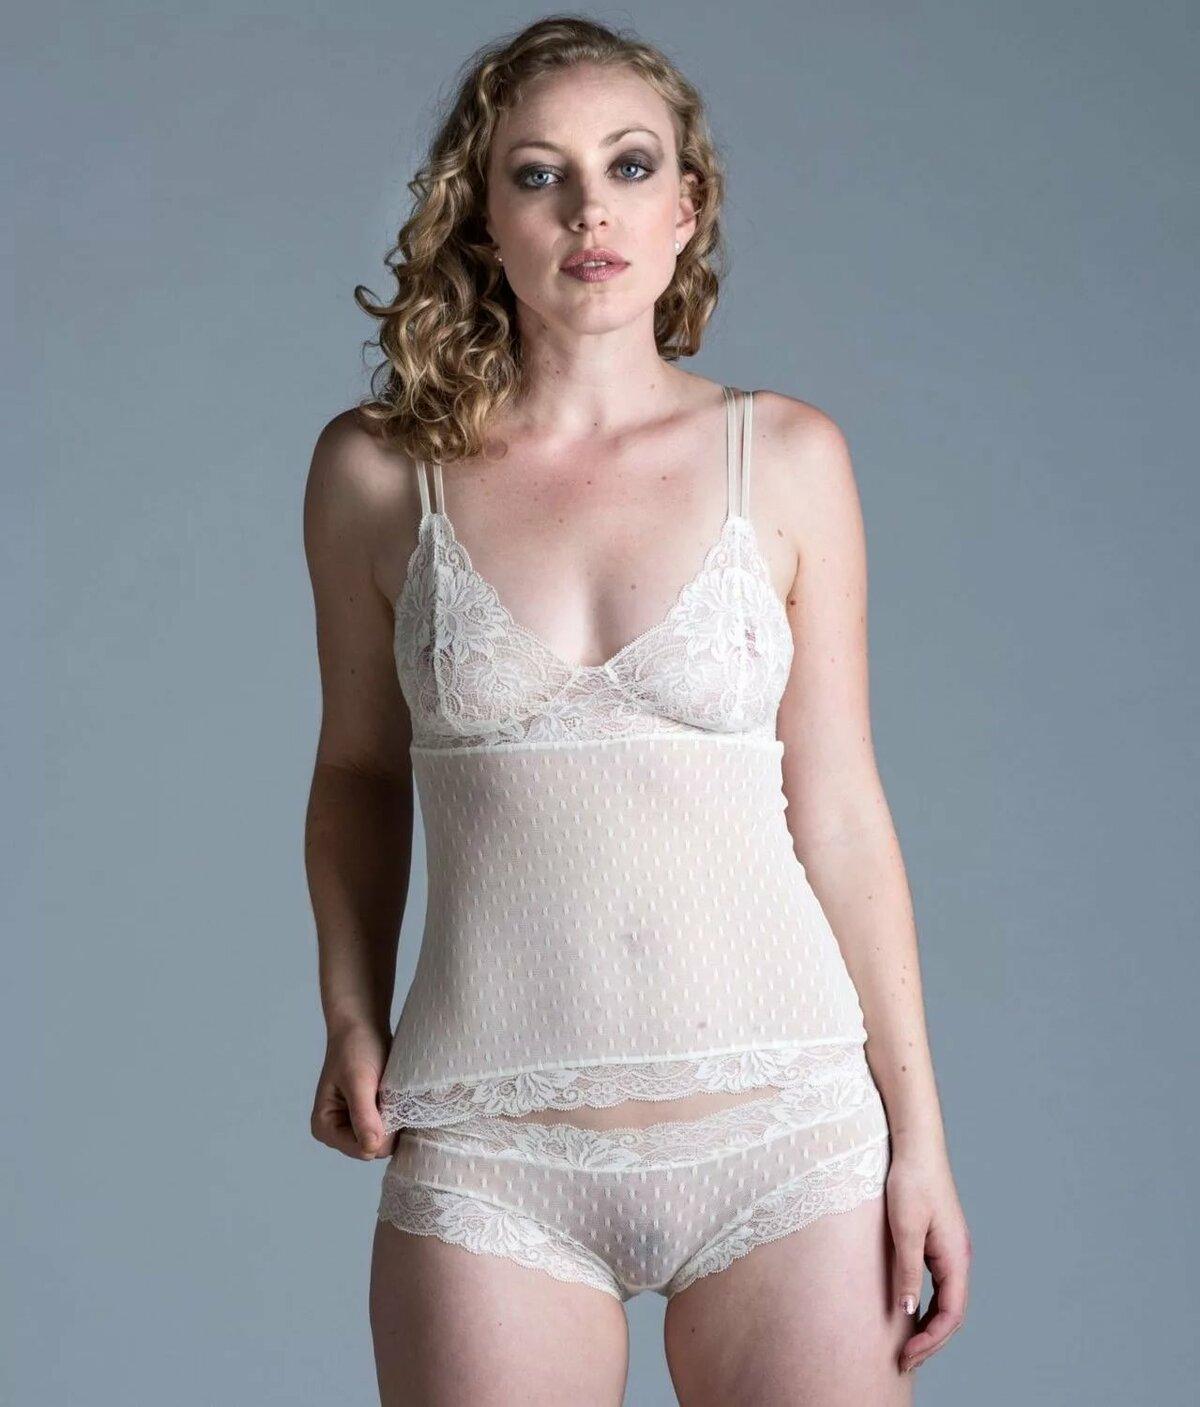 Tgp seethru lingerie